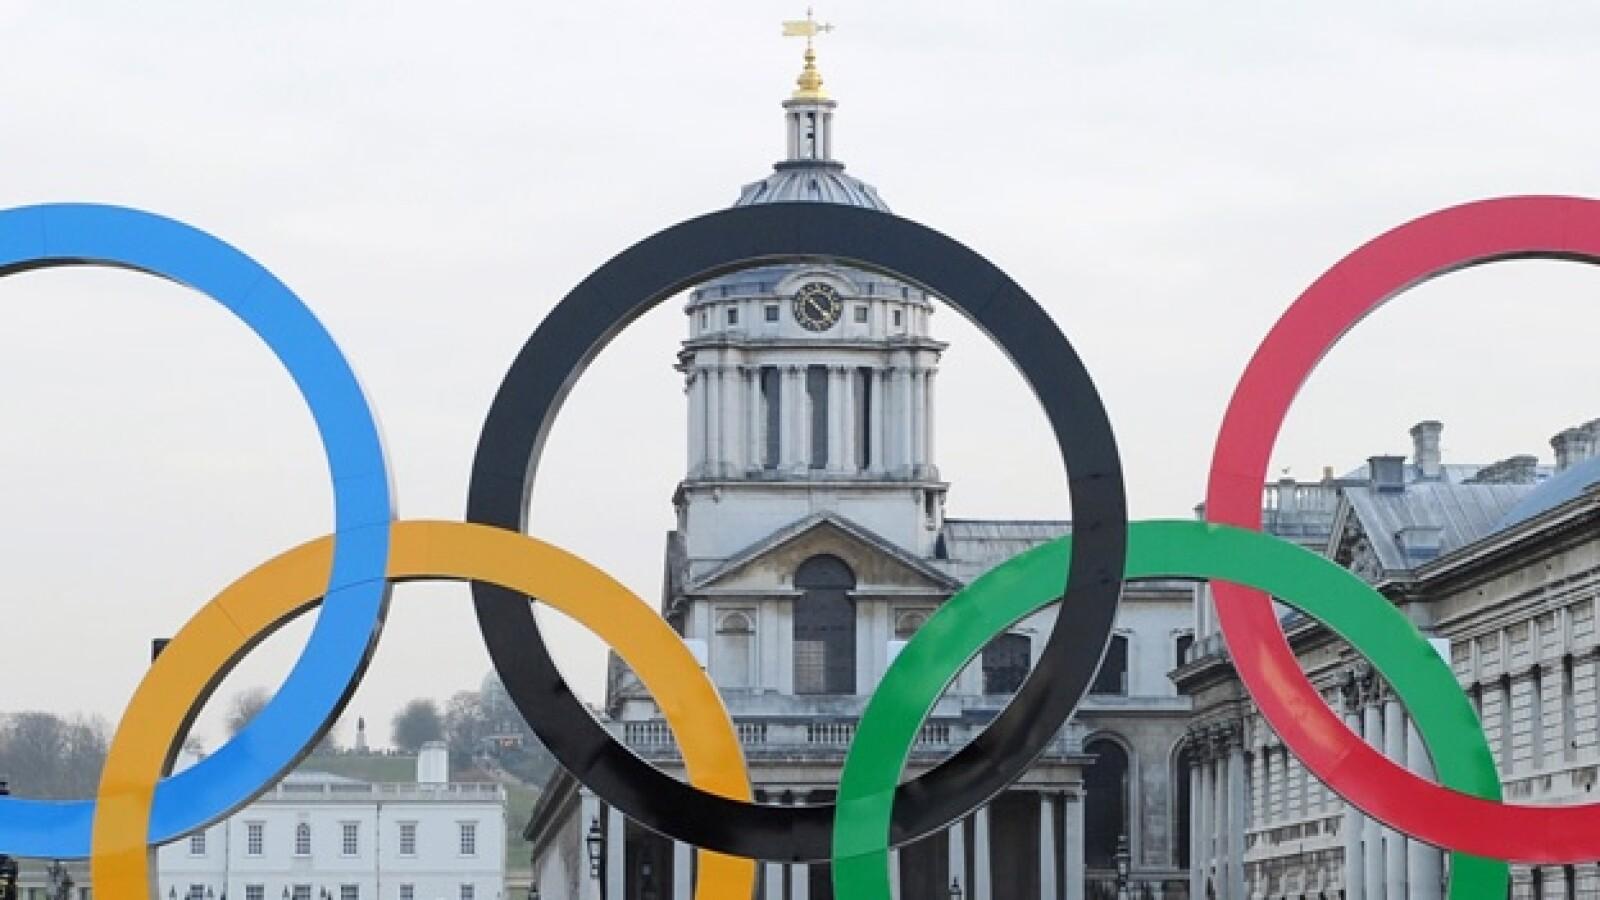 aros olímpicos Londres Támesis